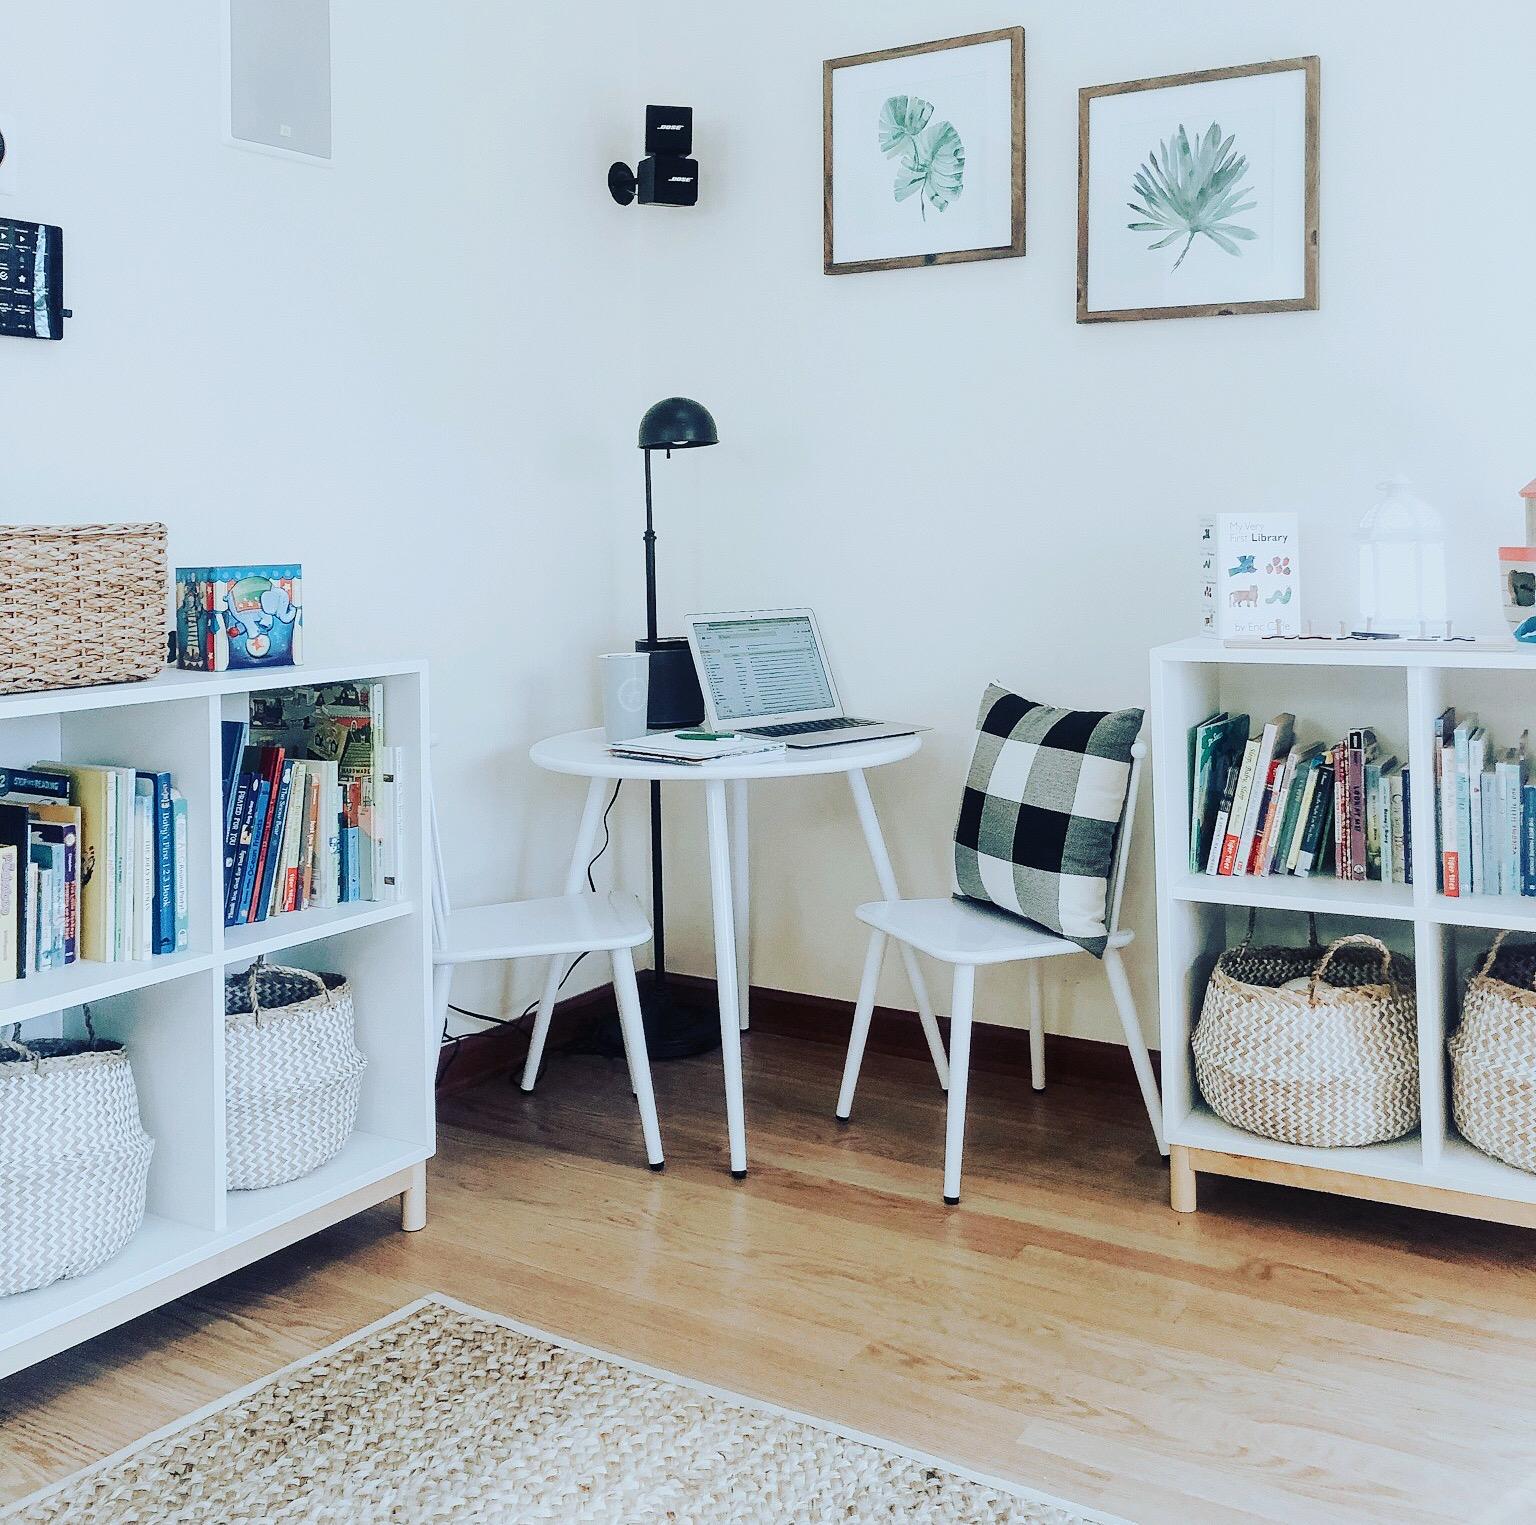 Kids Table & Chairs  |  Buffalo Check Pillow Case  |  Similar Art  |  Similar Art